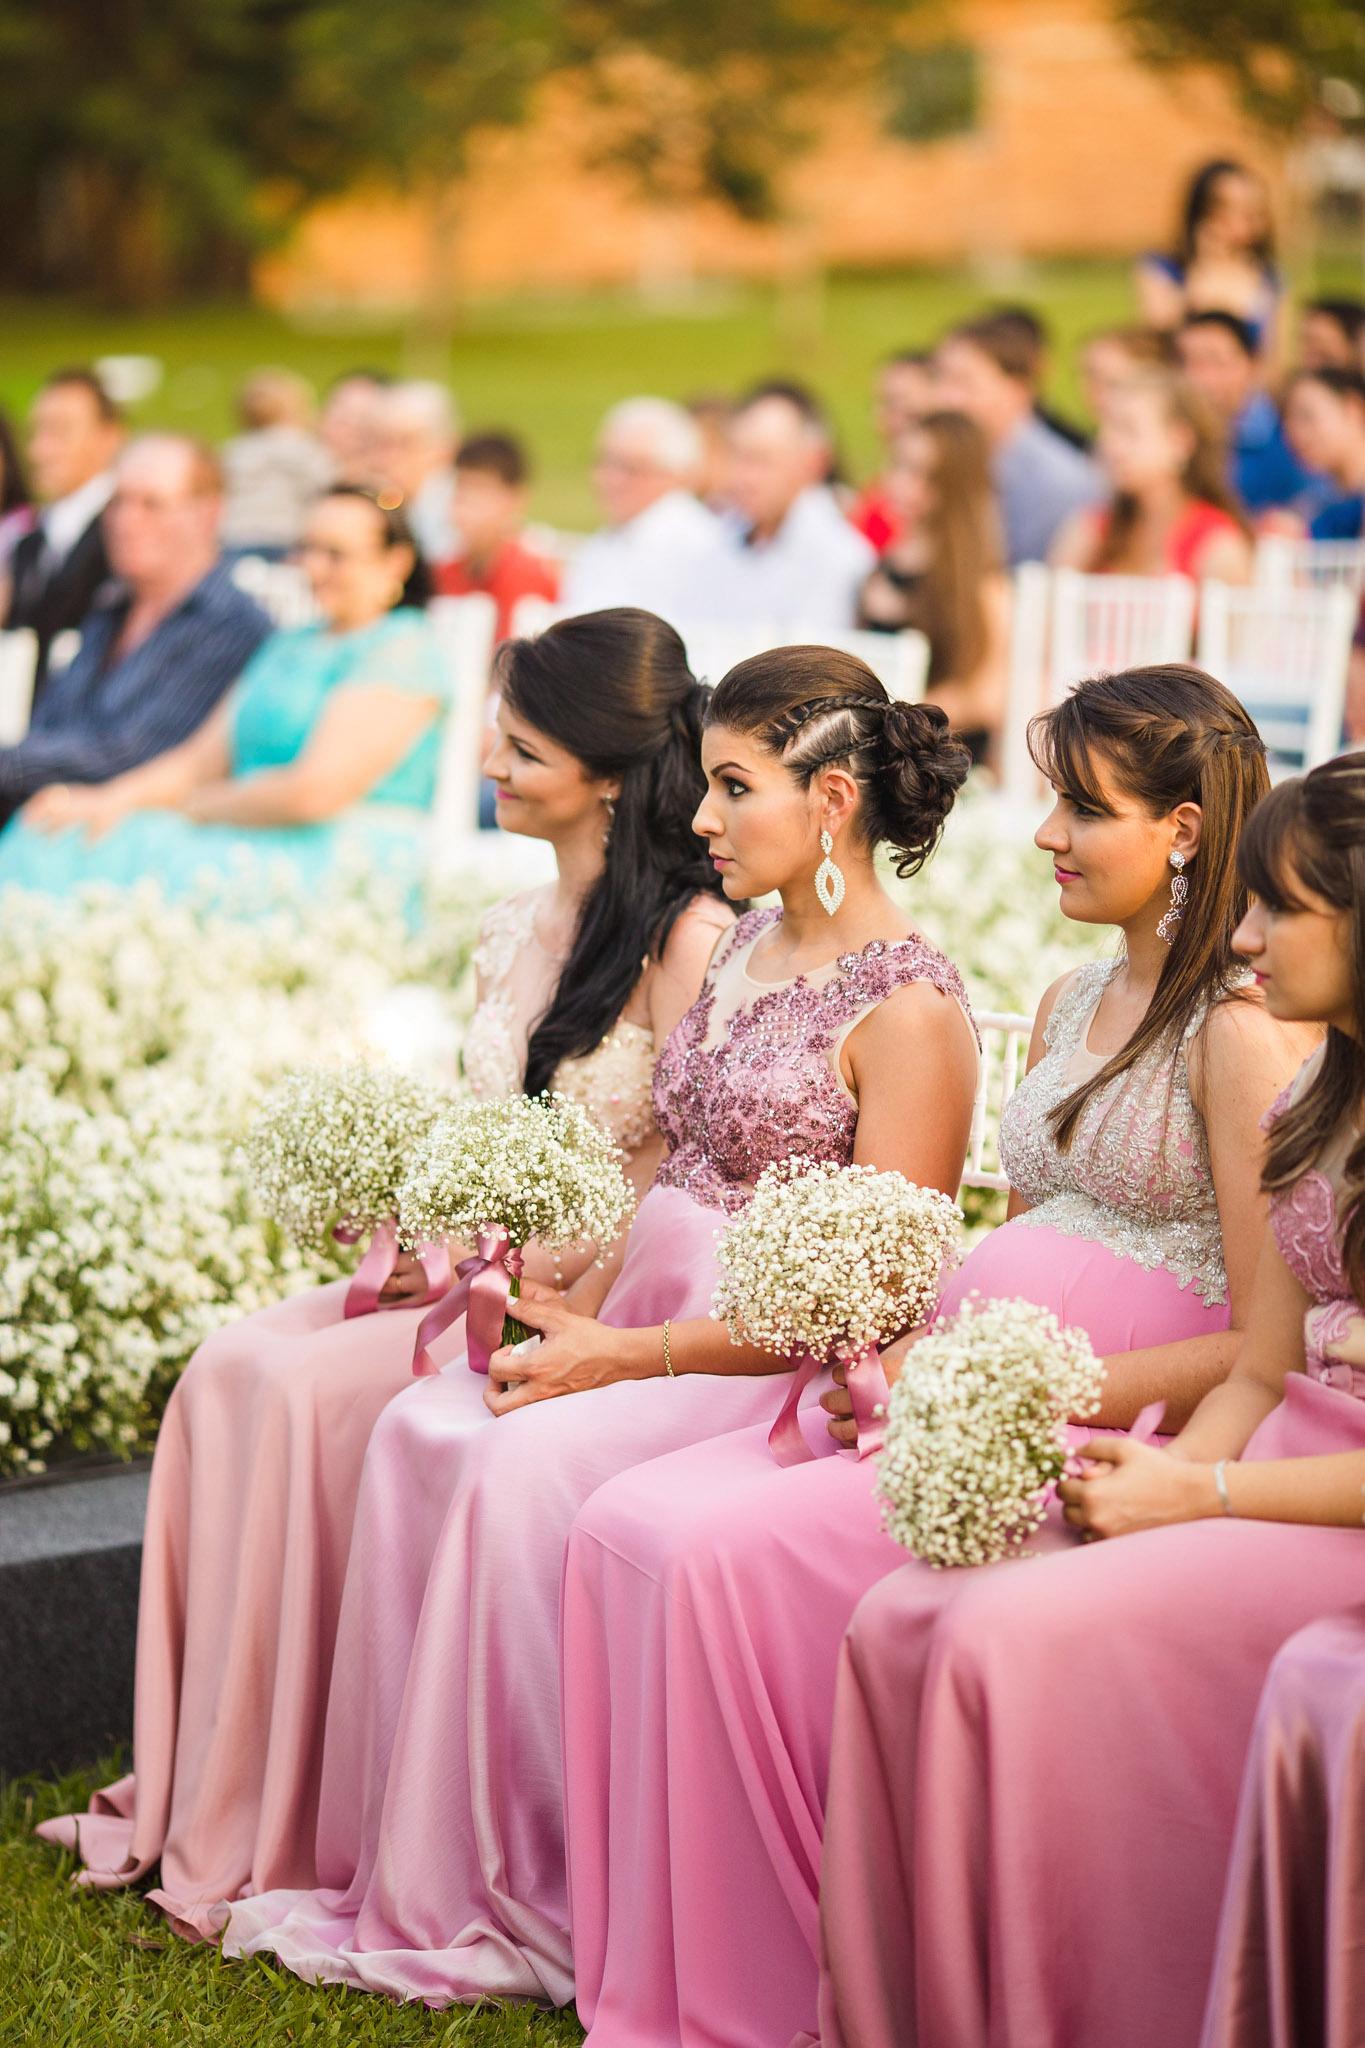 Wedding_Travellers_Destination_Wedding_Photography-73.jpg